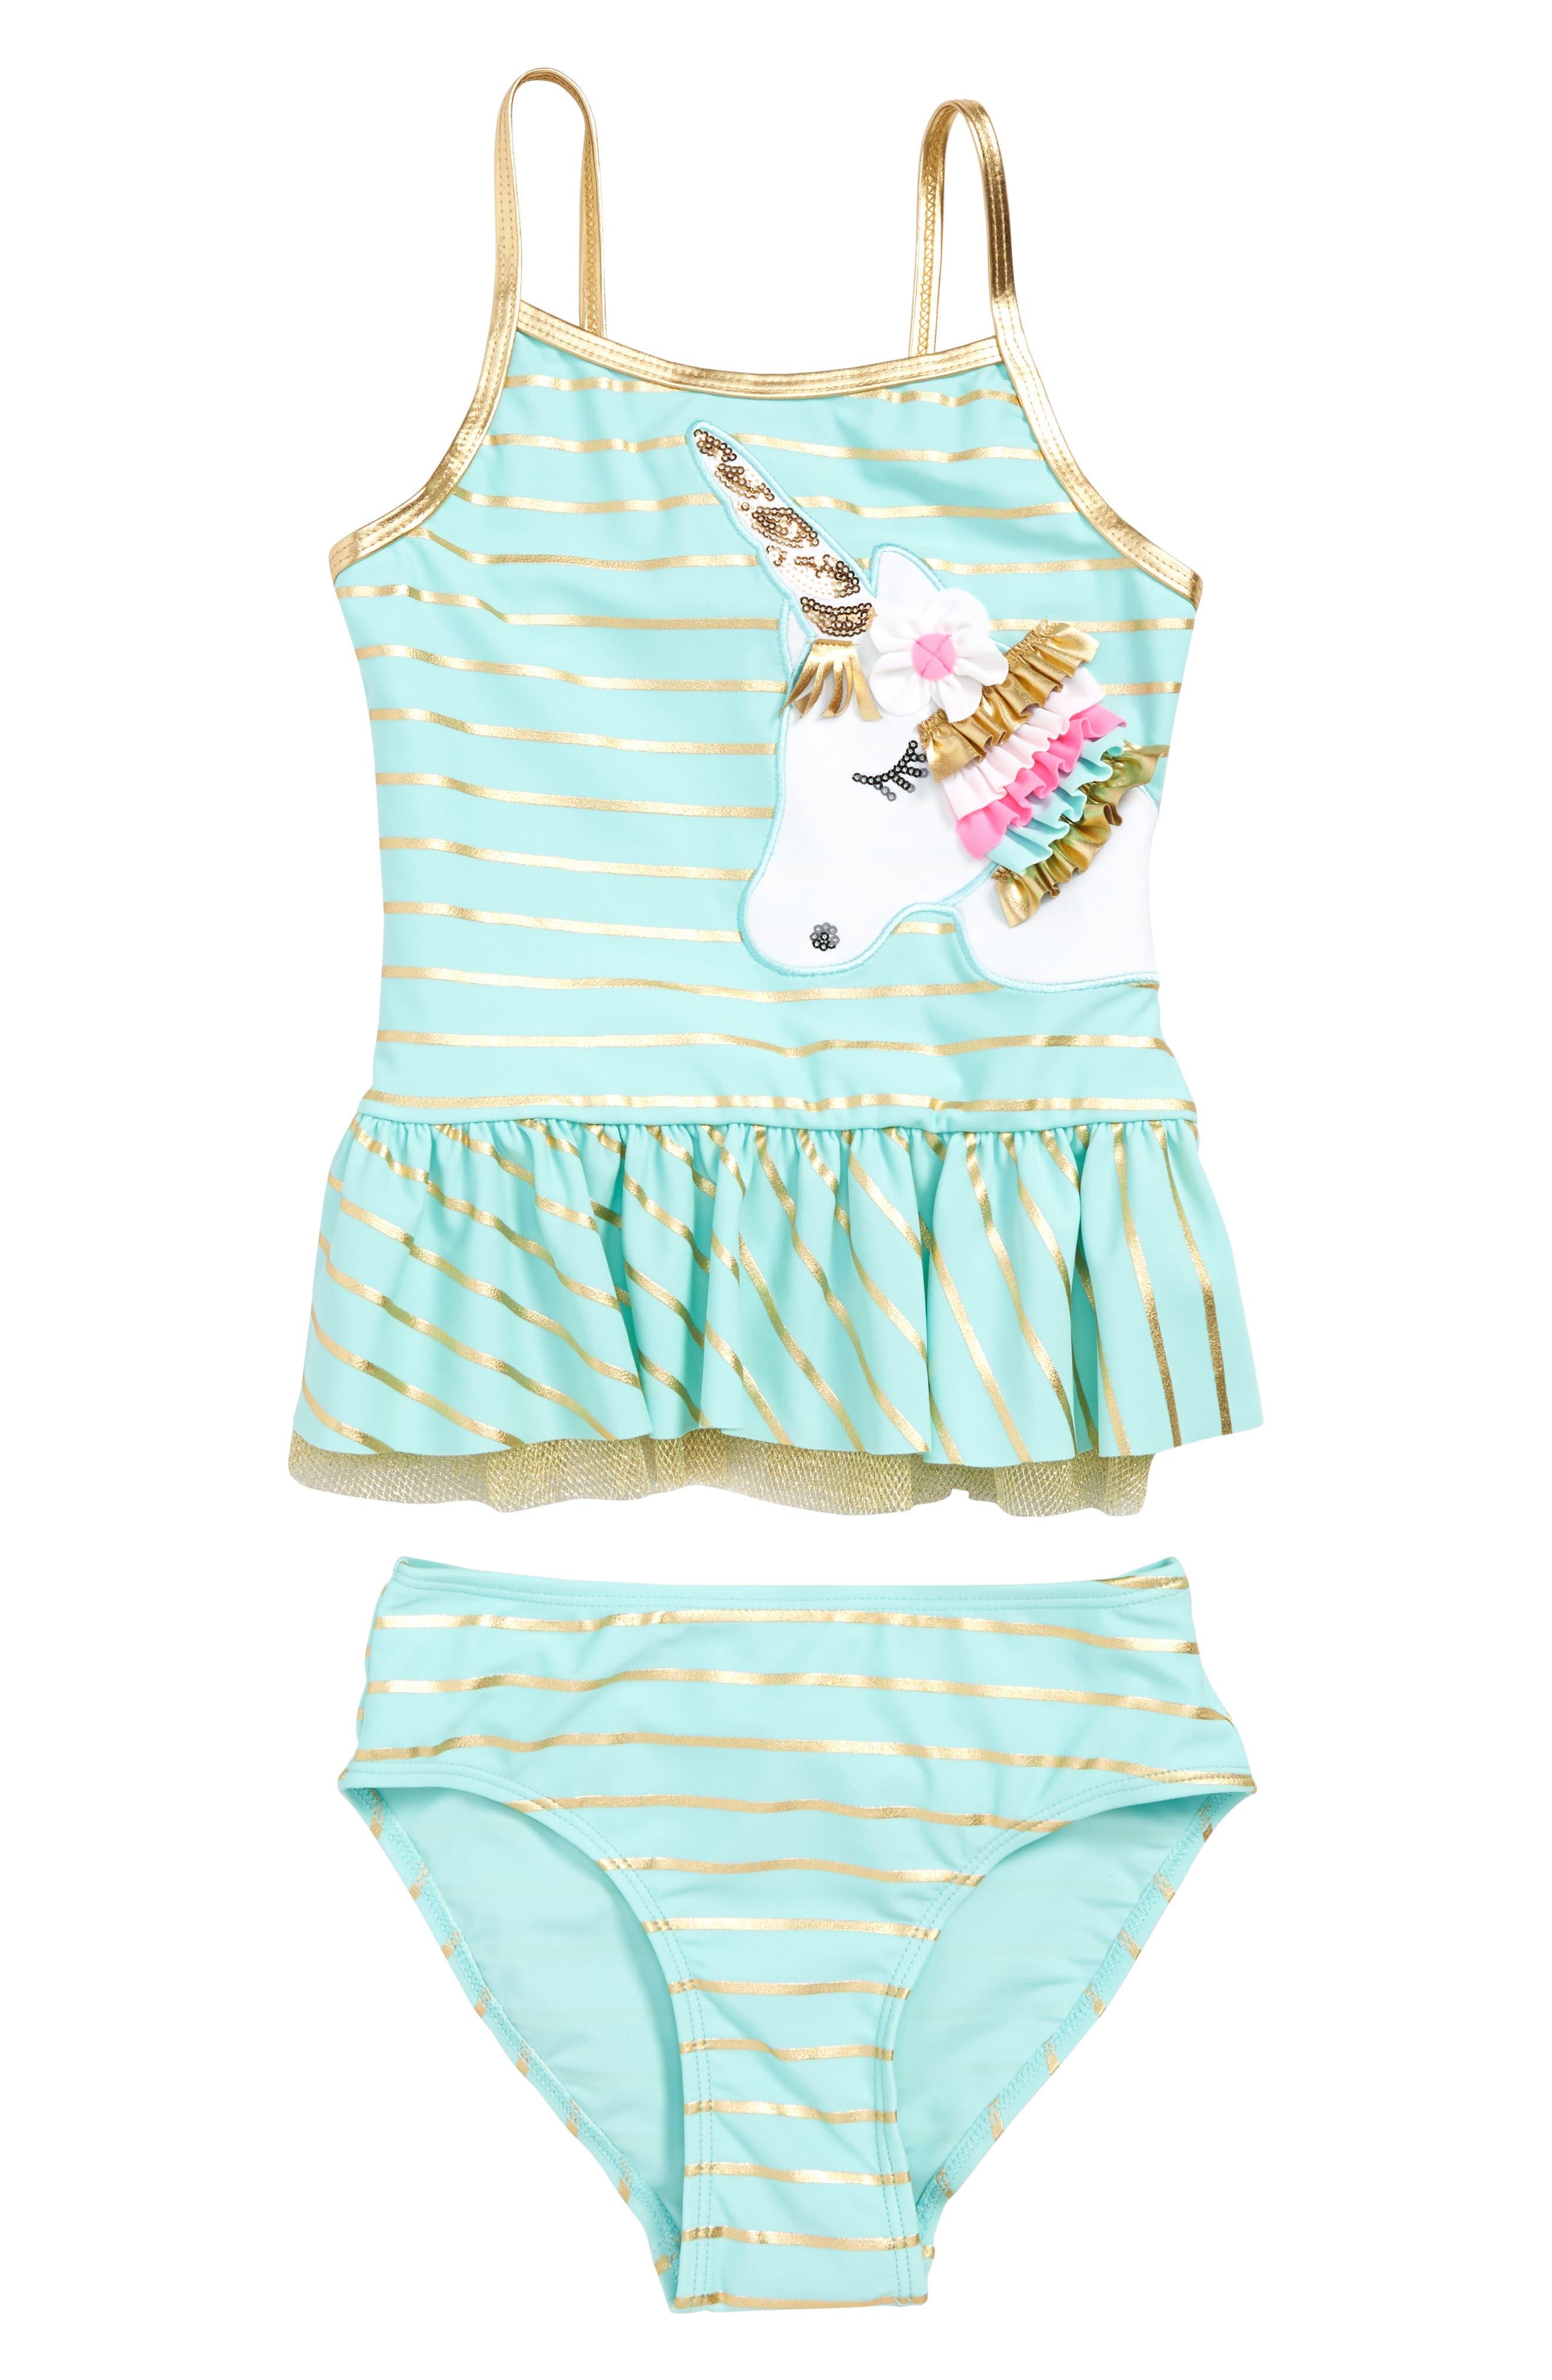 Toddler Girls Flapdoodles Unicorn Tankini TwoPiece Swimsuit Size 4T  Blue